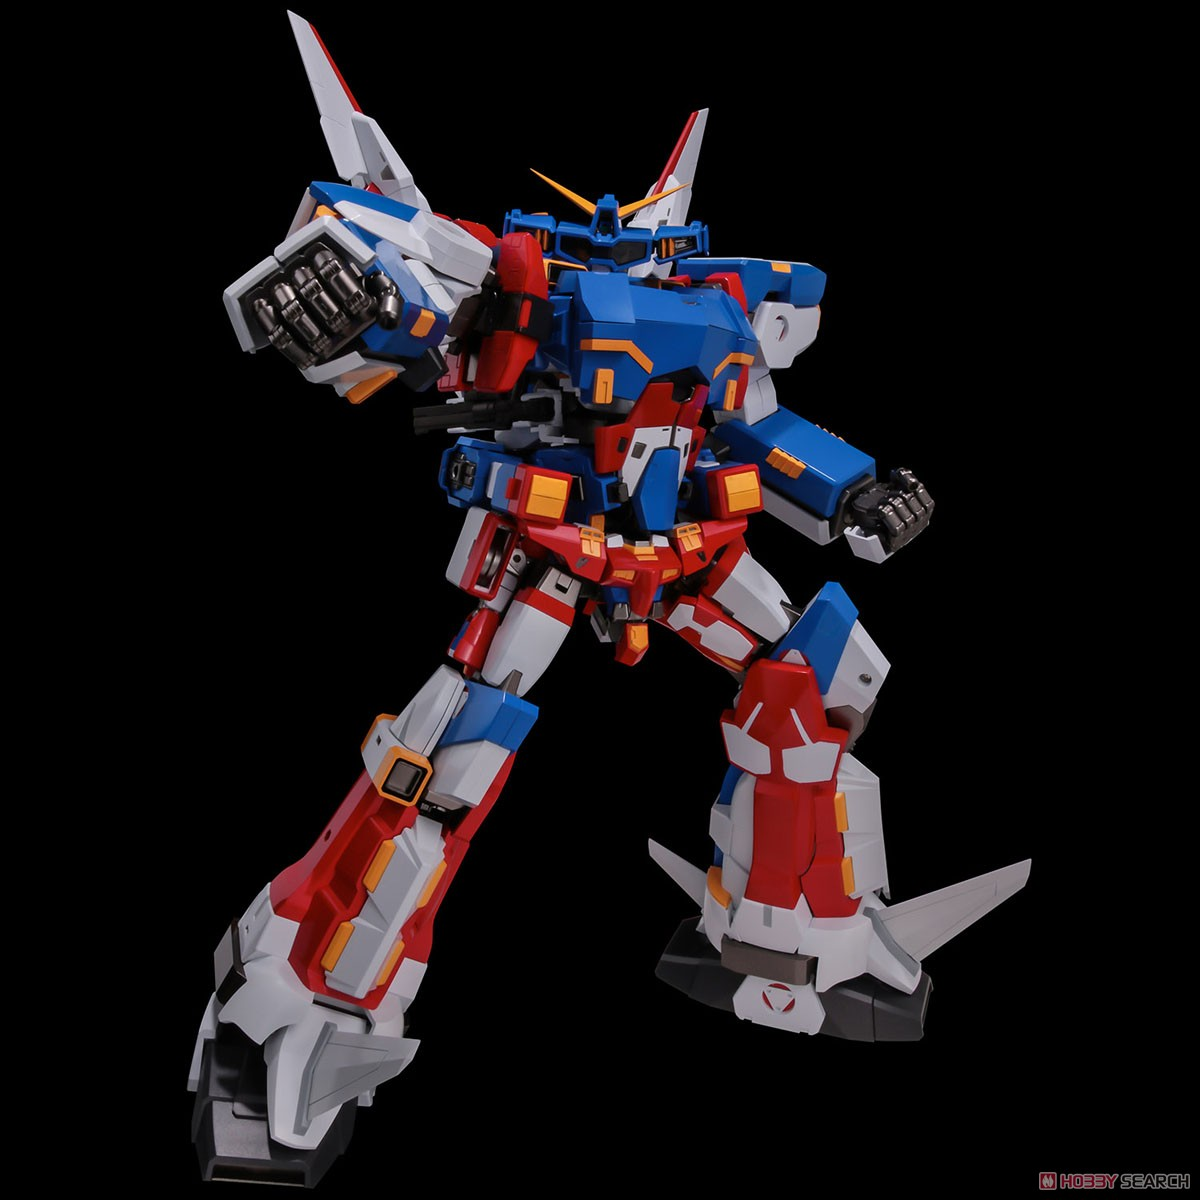 RIOBOT『変形合体 R-1』スーパーロボット大戦OG 可変合体フィギュア-040